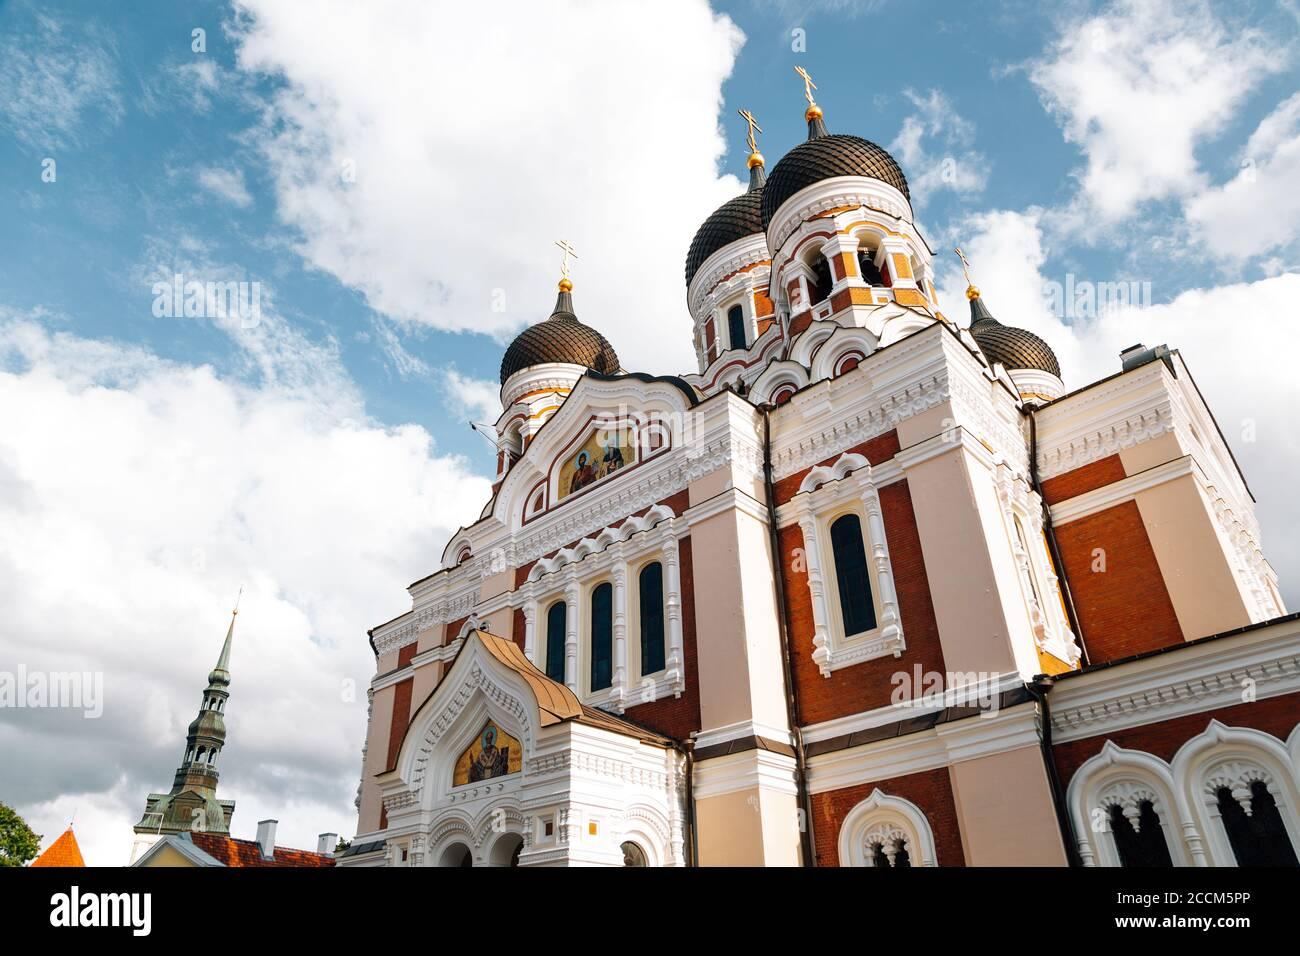 Alexander-Newski-Kathedrale in Tallinn, Estland Stockfoto